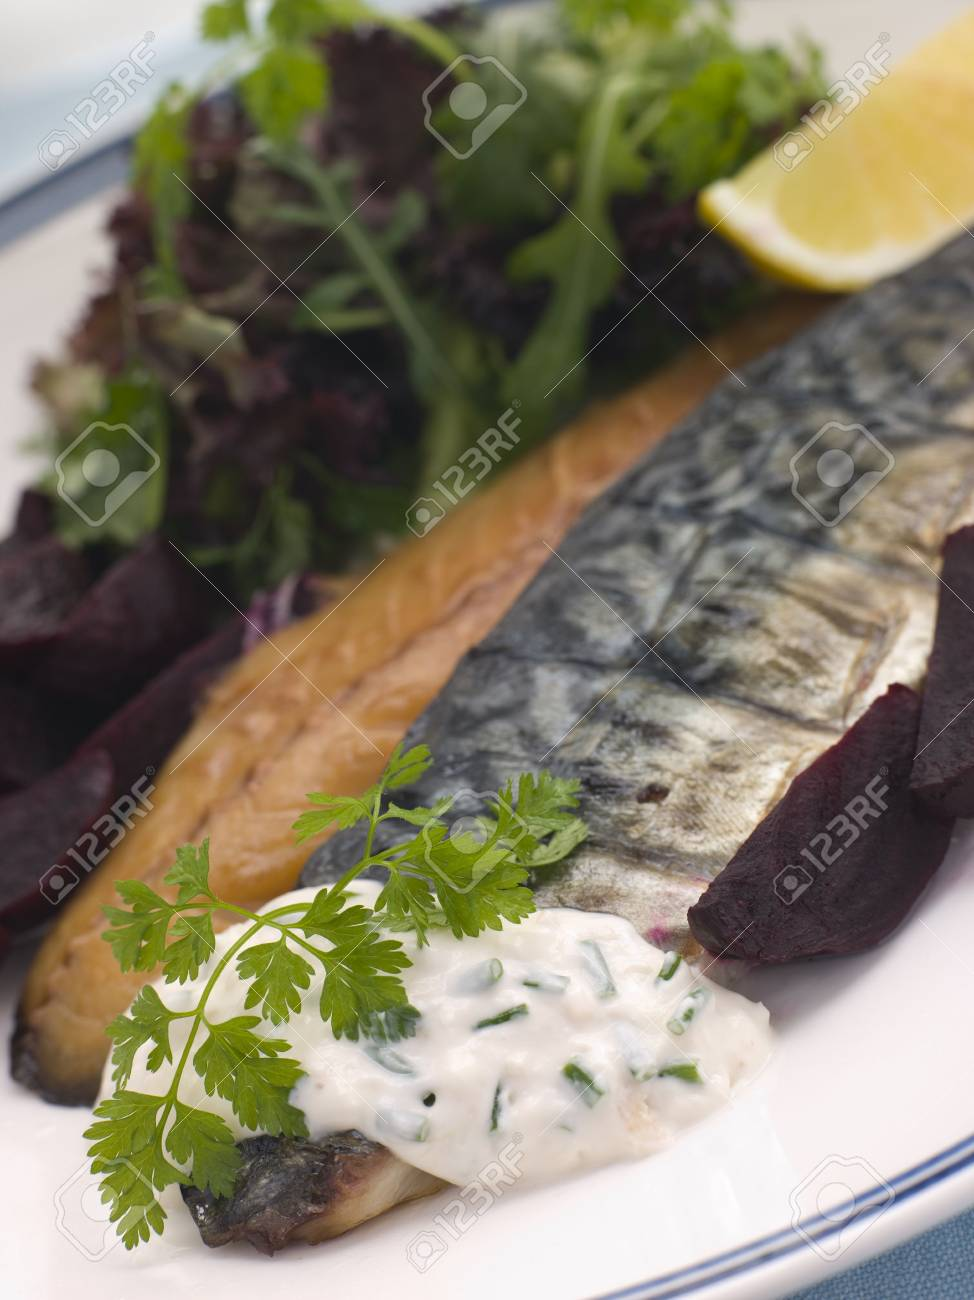 Smoked Mackerel Beetroot Salad with Horseradish Cream Stock Photo - 3444236